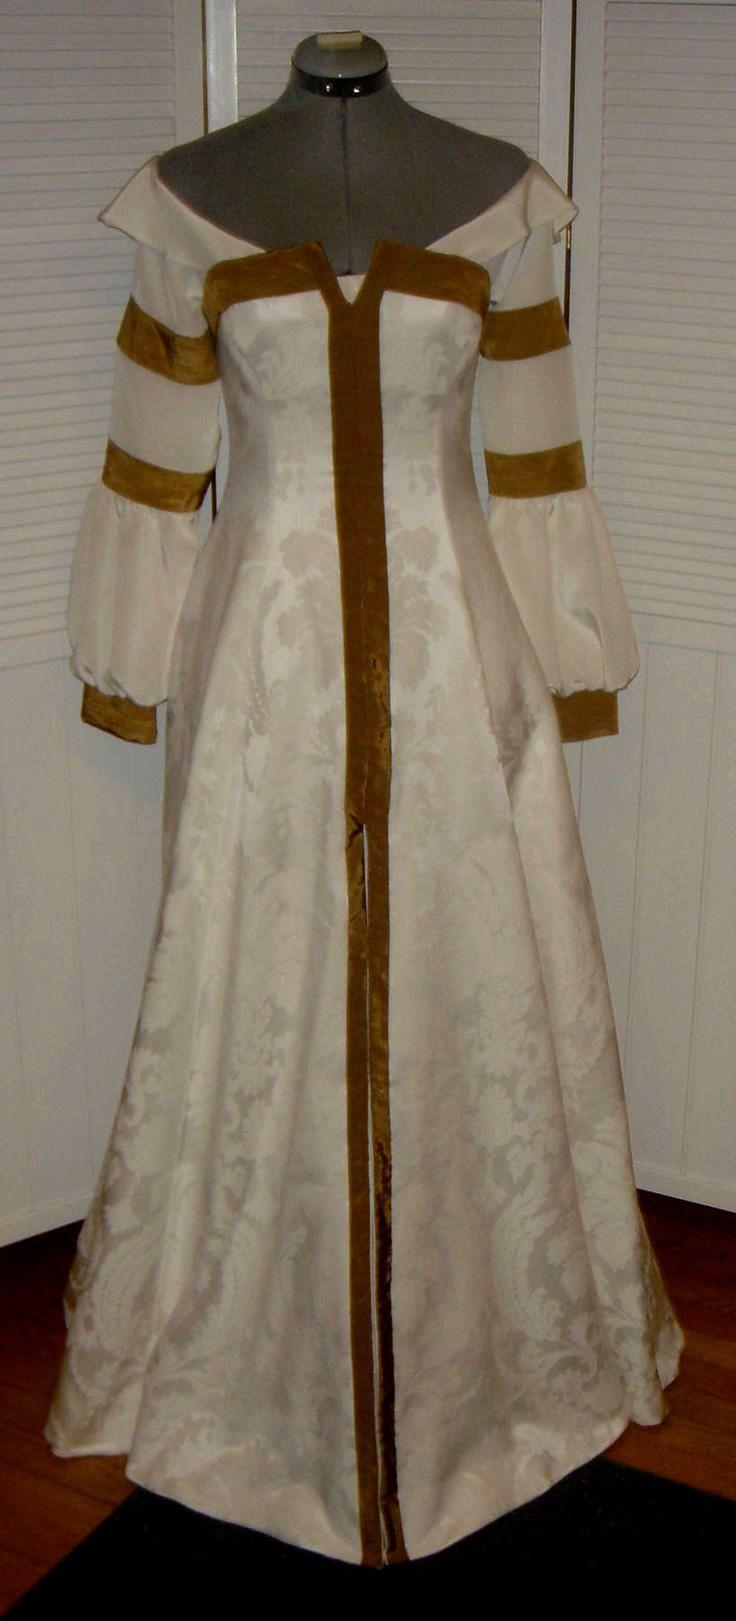 FANTASY & MEDIEVAL WONDERFULL FASHION Susan dress